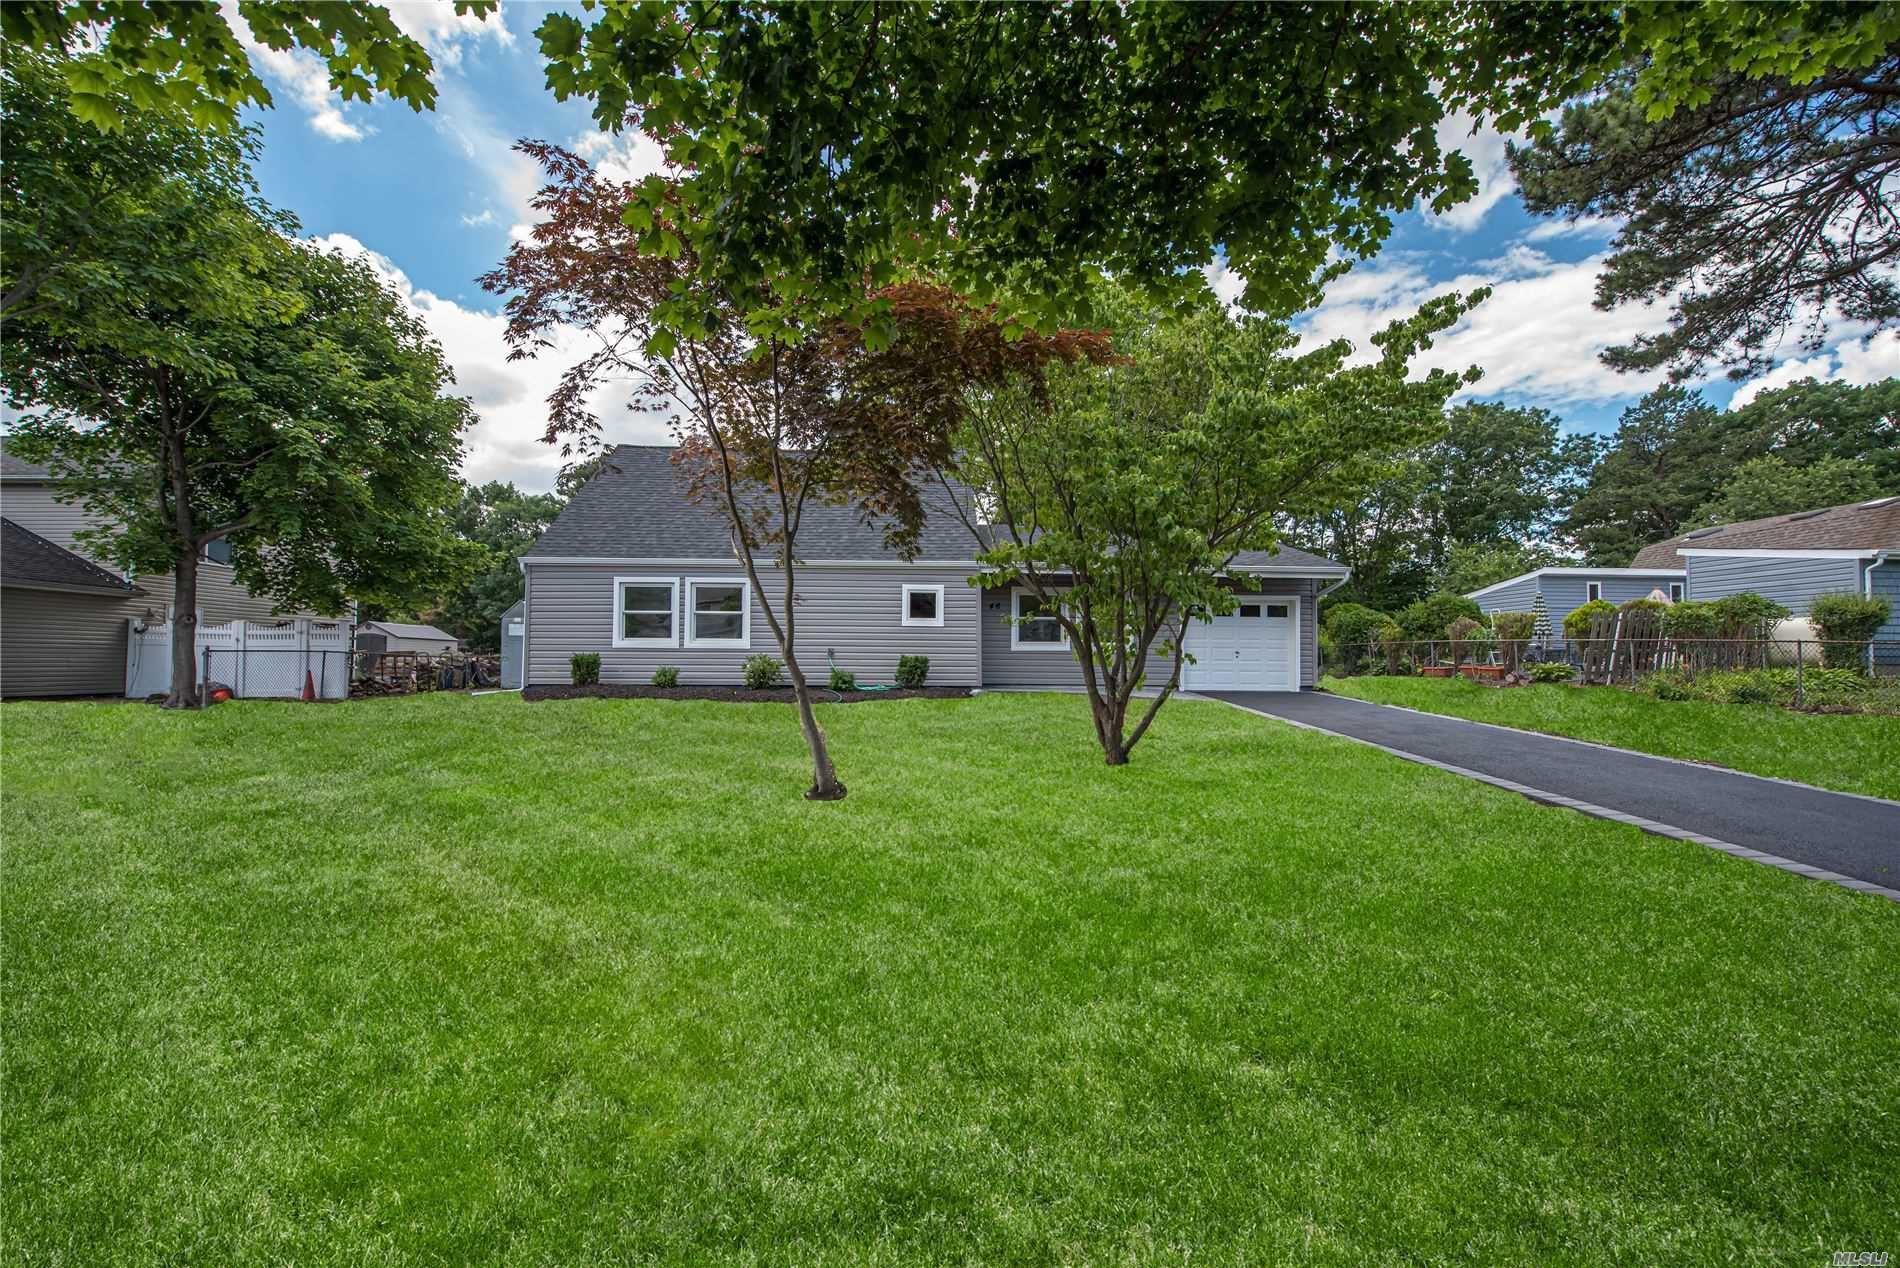 46 Pitchpine Pl, Medford, NY 11763 - MLS#: 3229494